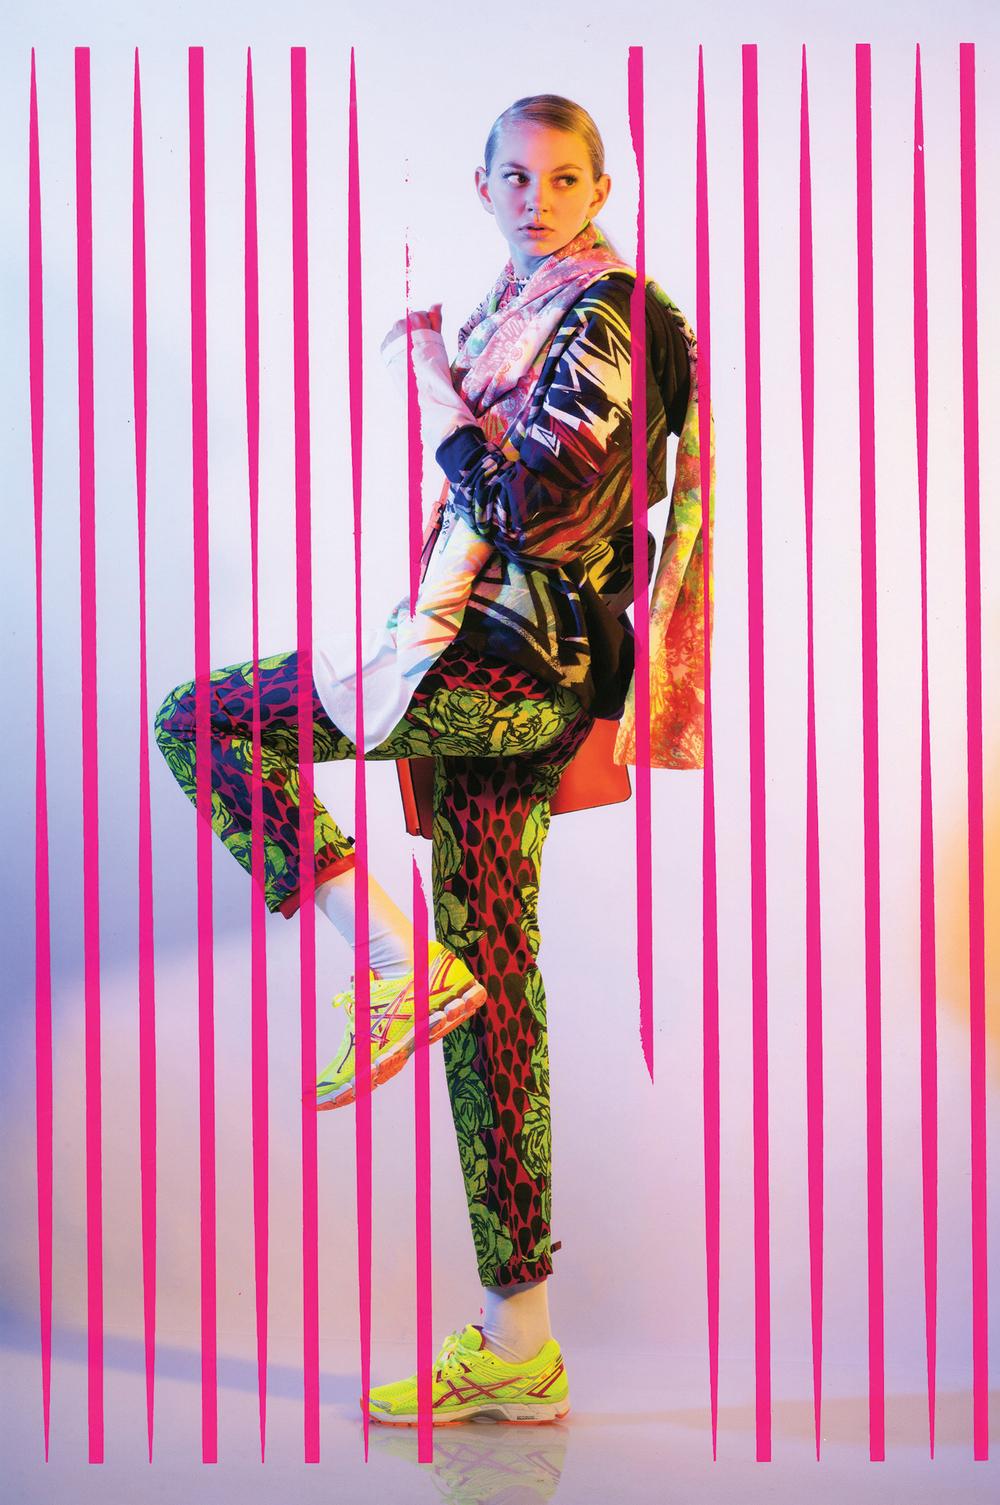 Hoodie and Scarf by Ben Copperwheat. Pants by Jaci Hodges, MFA Fashion Design, and Nisha Hanna Btesh, MFA Textile Design.